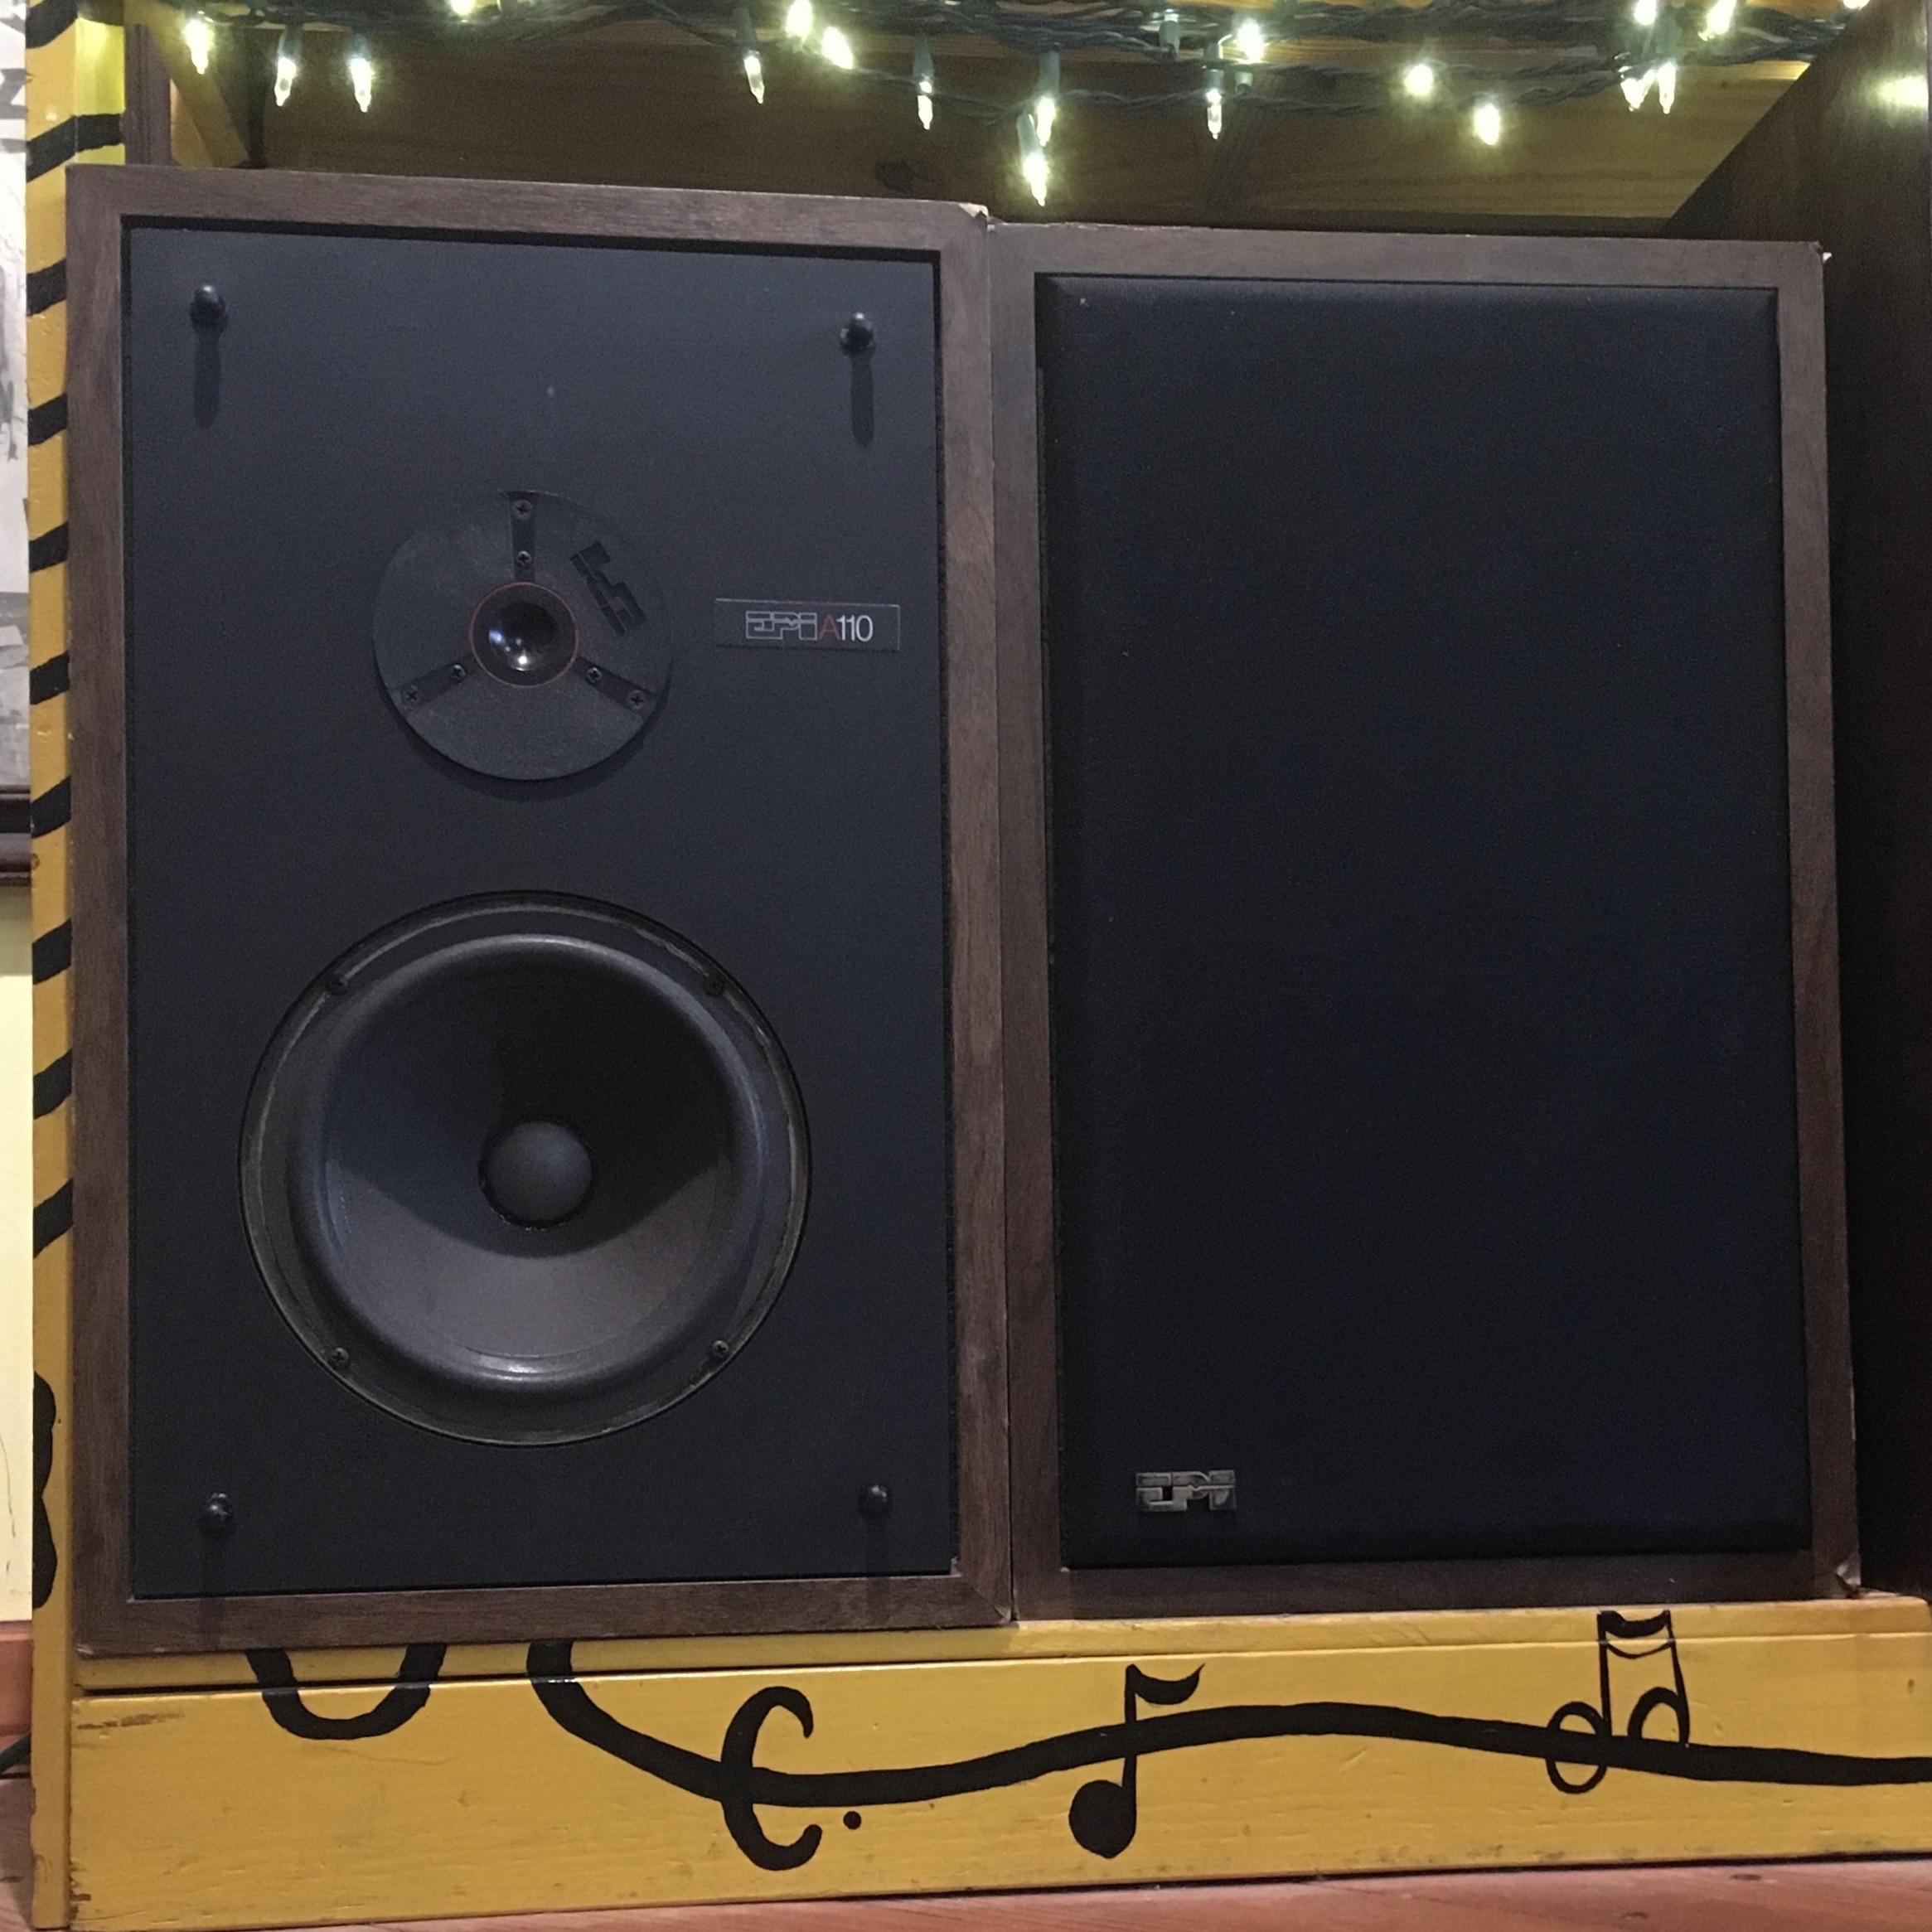 EPI A110 SPEAKERS: 2-way, classic bookshelf charmers! Sound